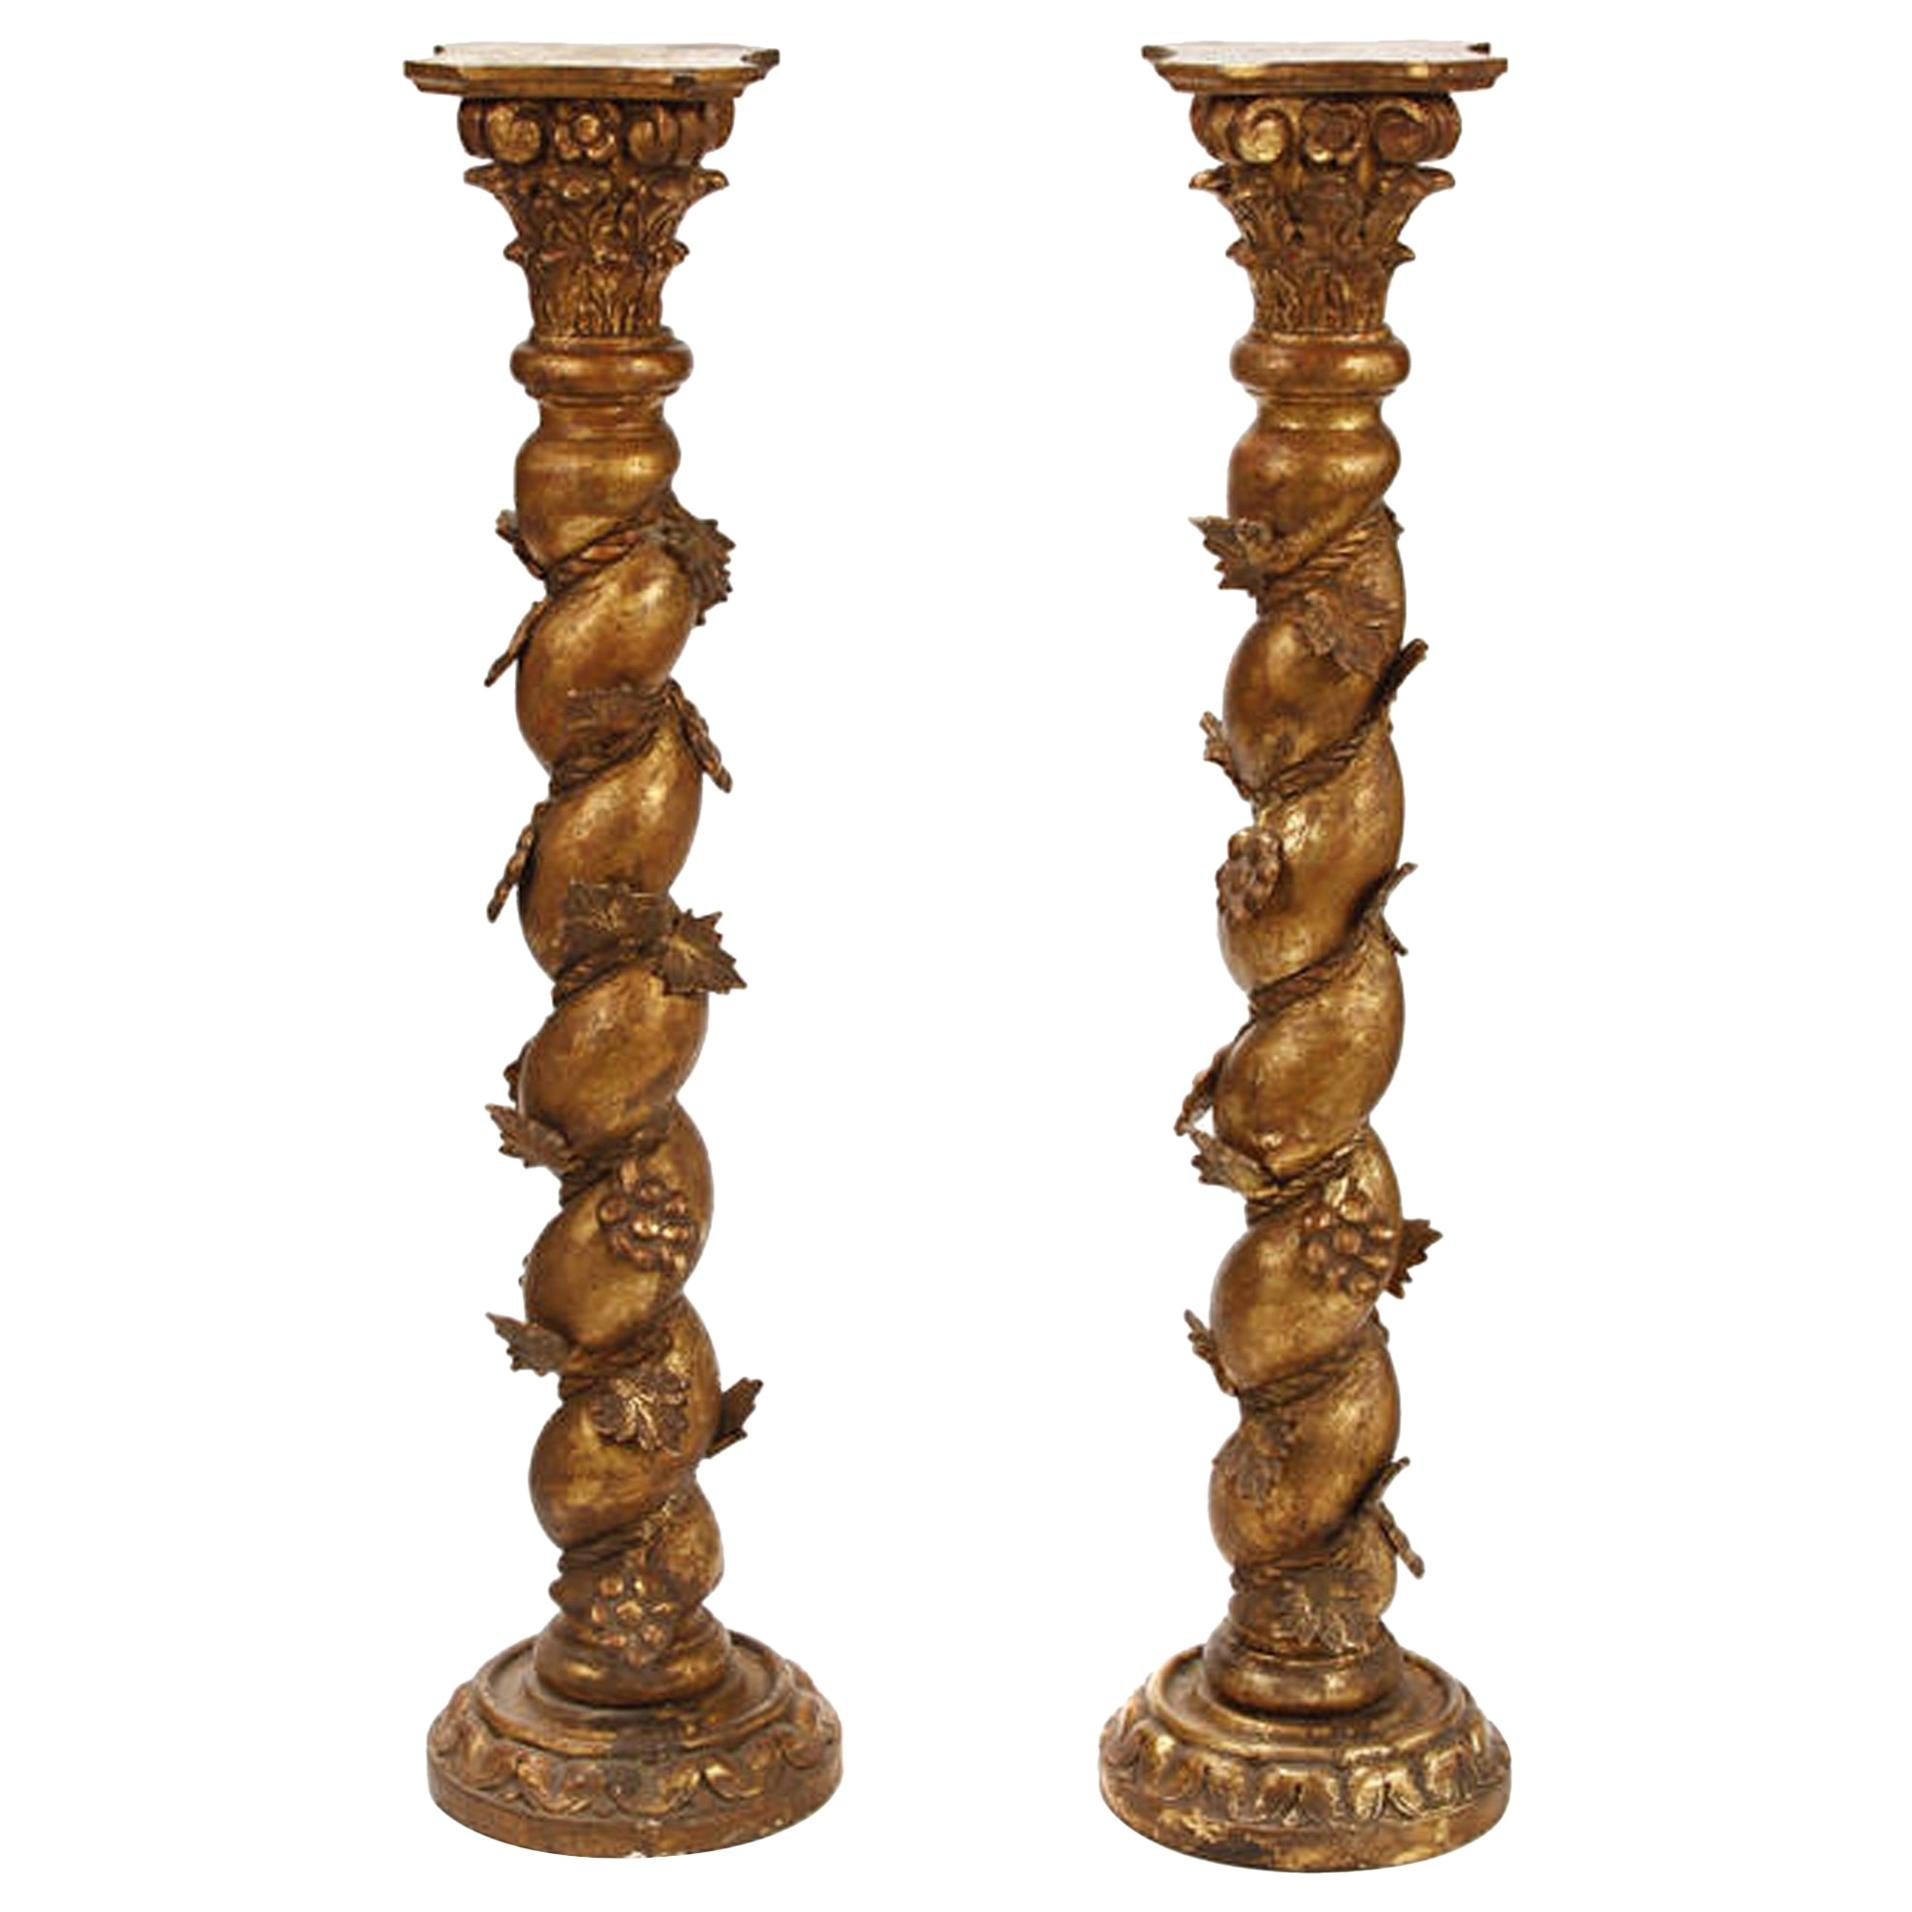 Pair of Italian Baroque Style Giltwood Column Pedestals